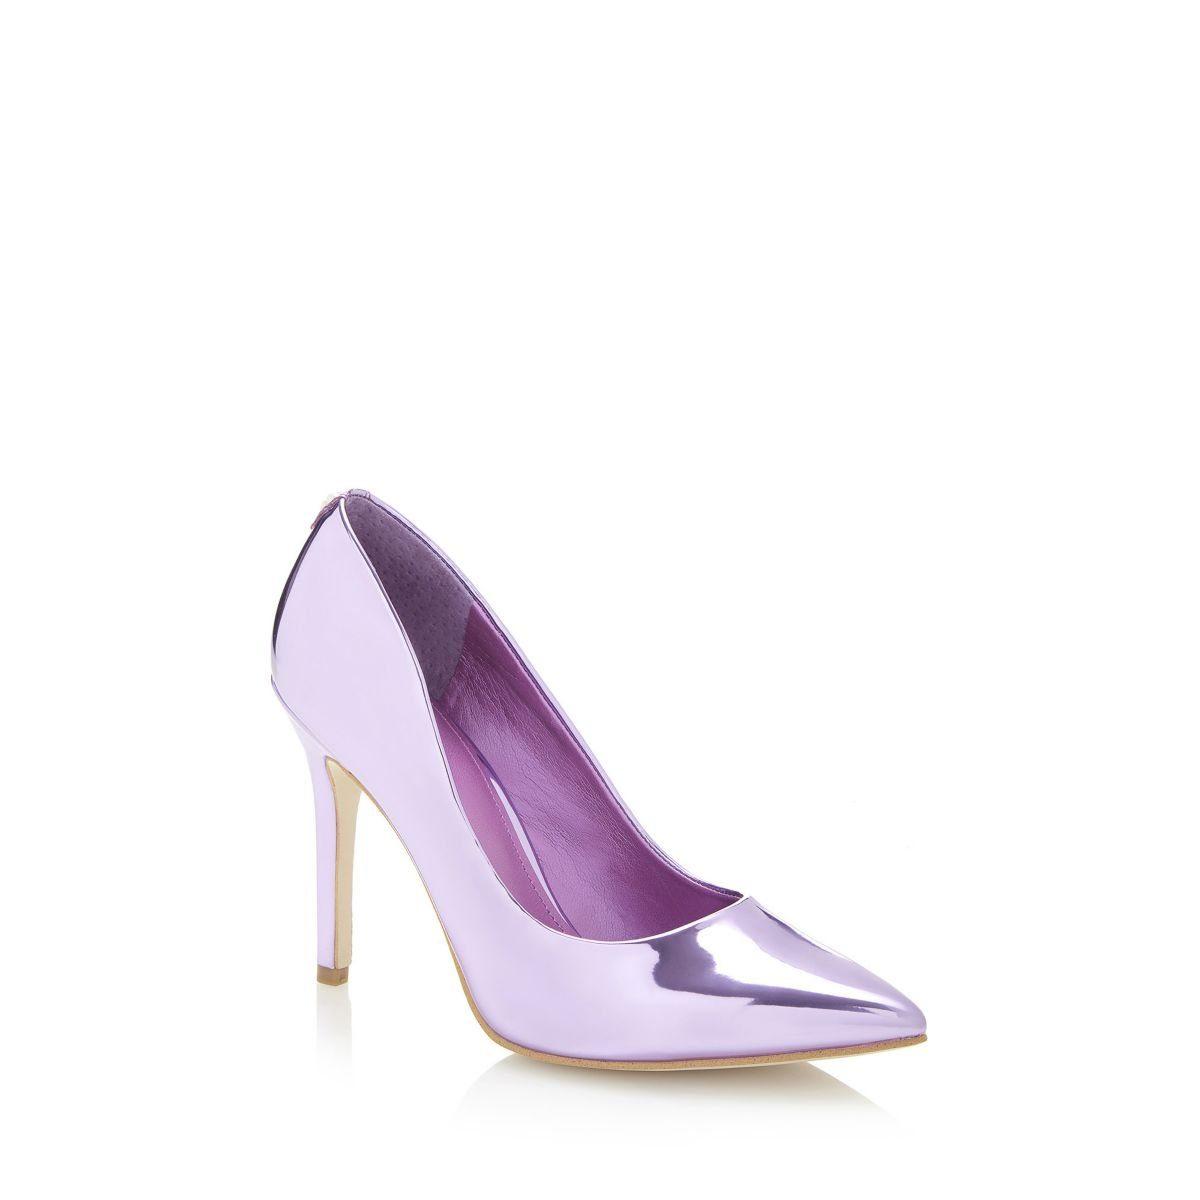 Guess Pumps online kaufen  violett